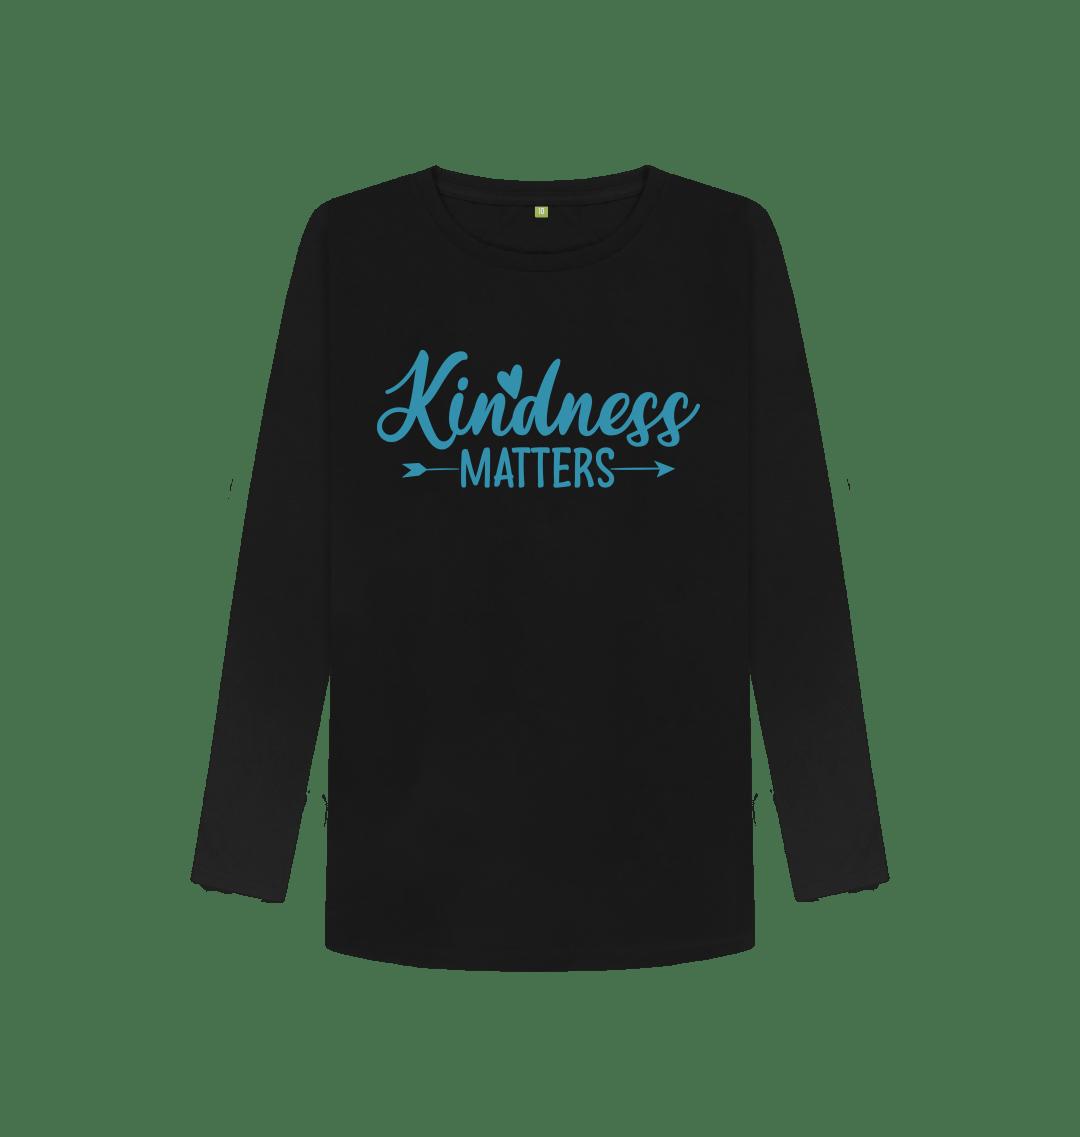 Kindness Matters Women's Long Sleeve Top Black